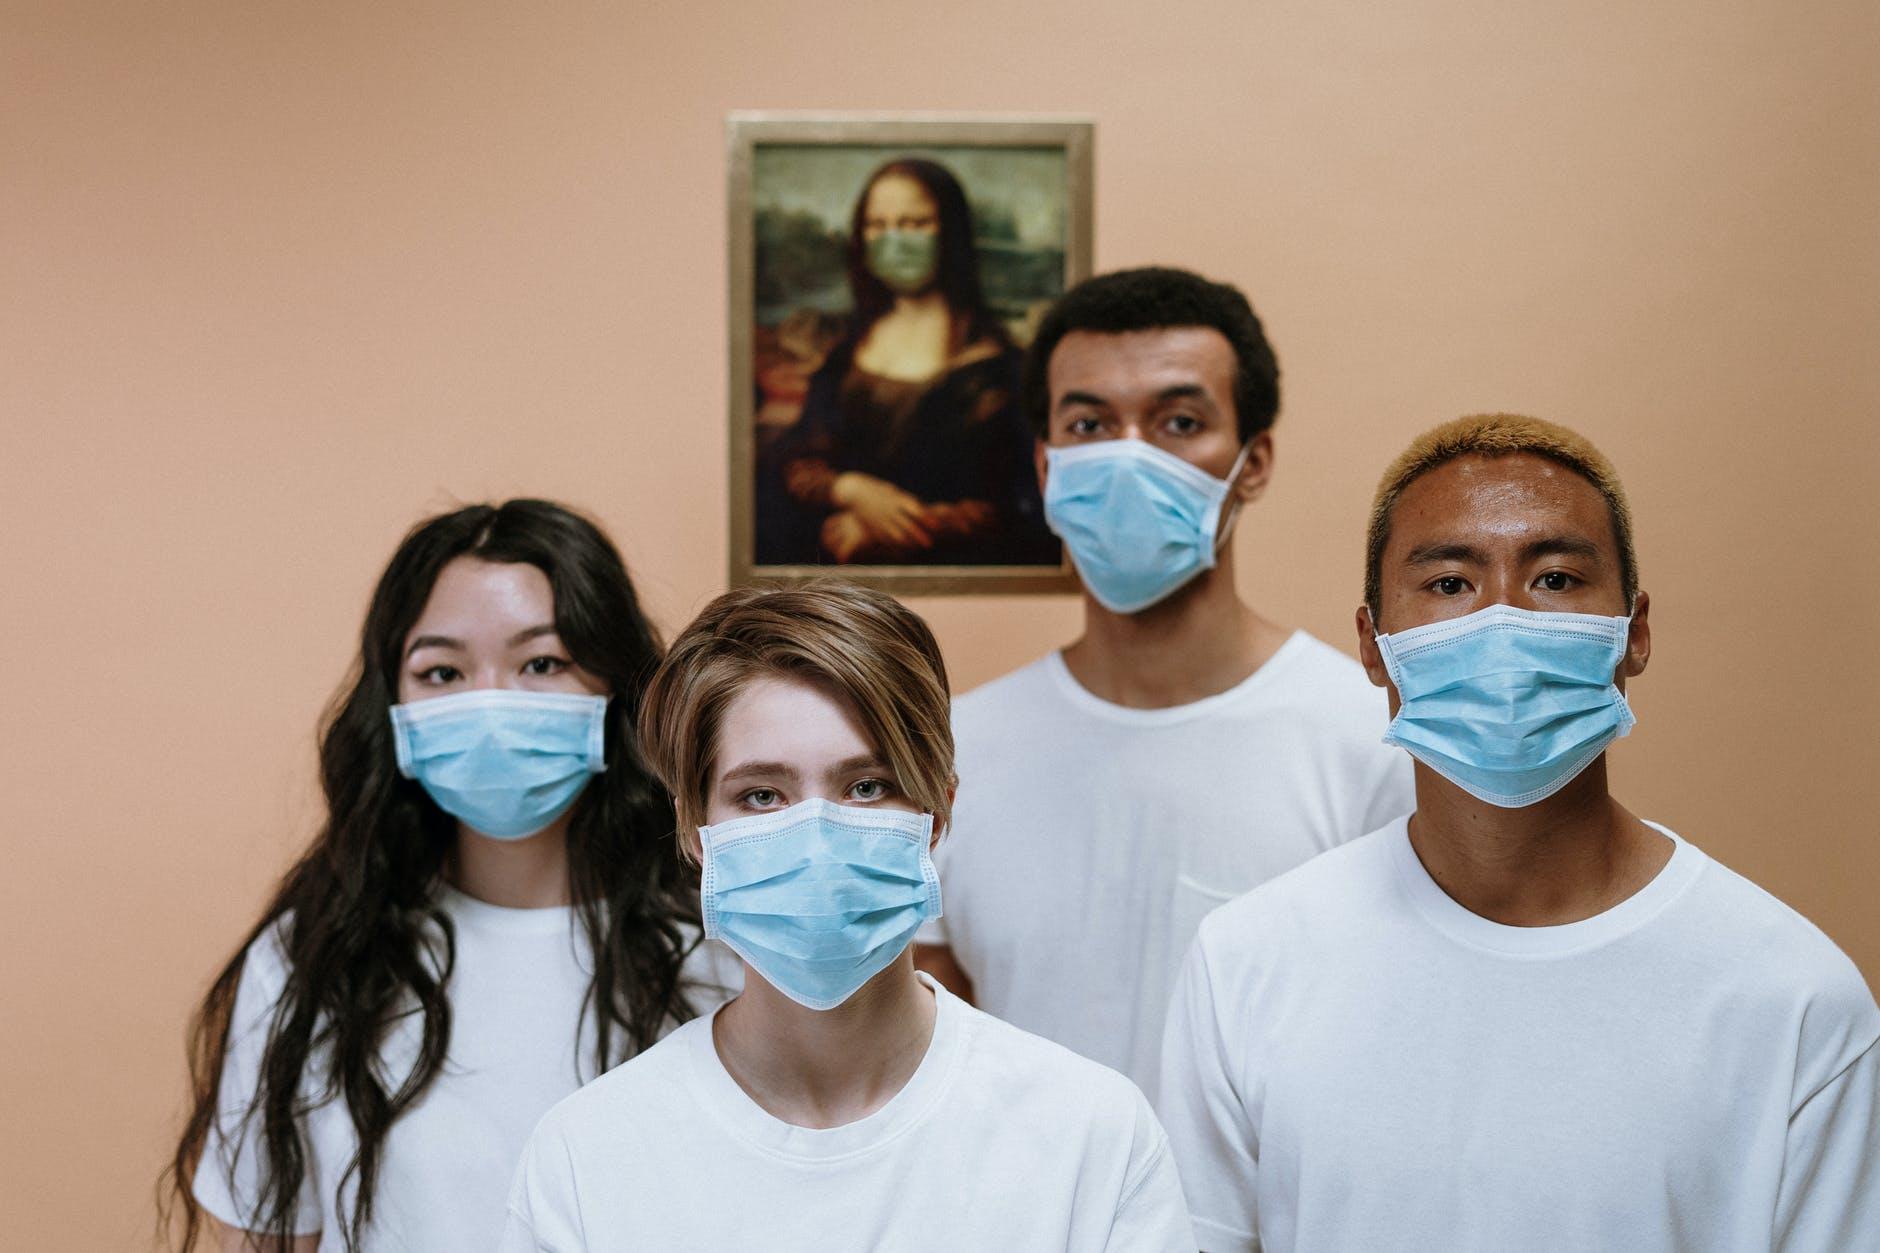 photo of people wearing masks